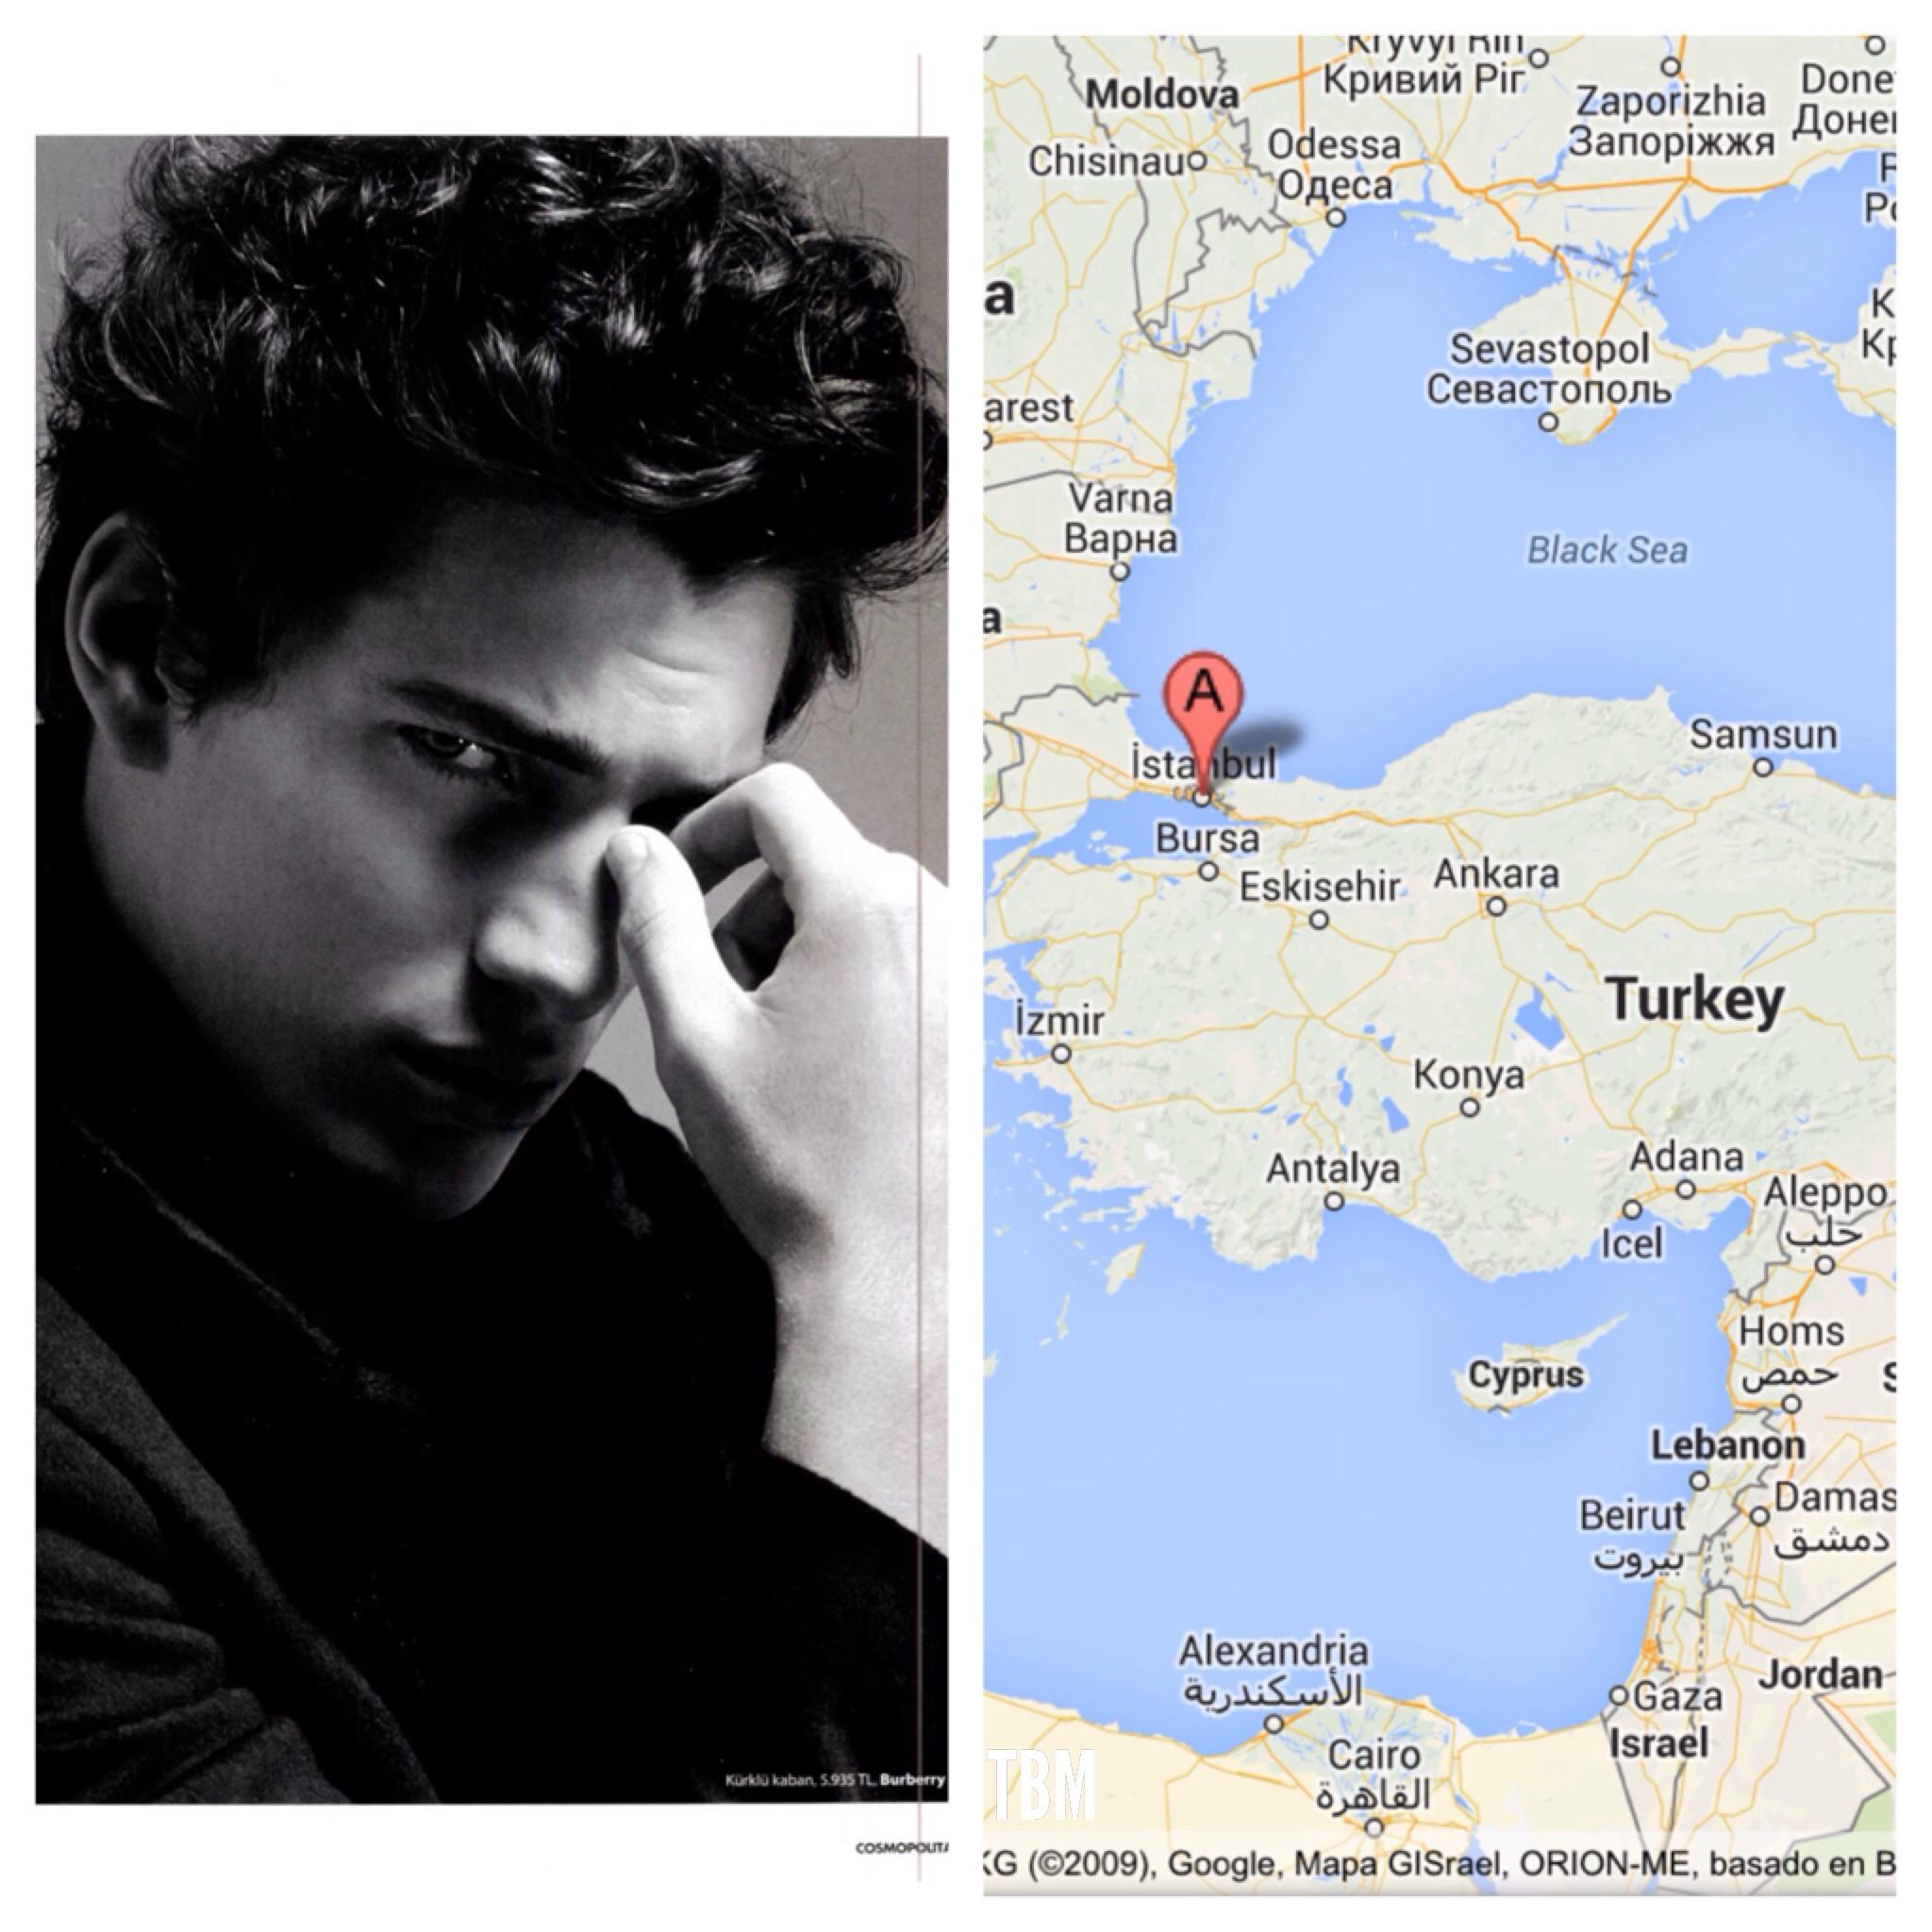 Cosmopolitan Turkey by Ergin Turunc | Istanbul, Turkey via Google Maps